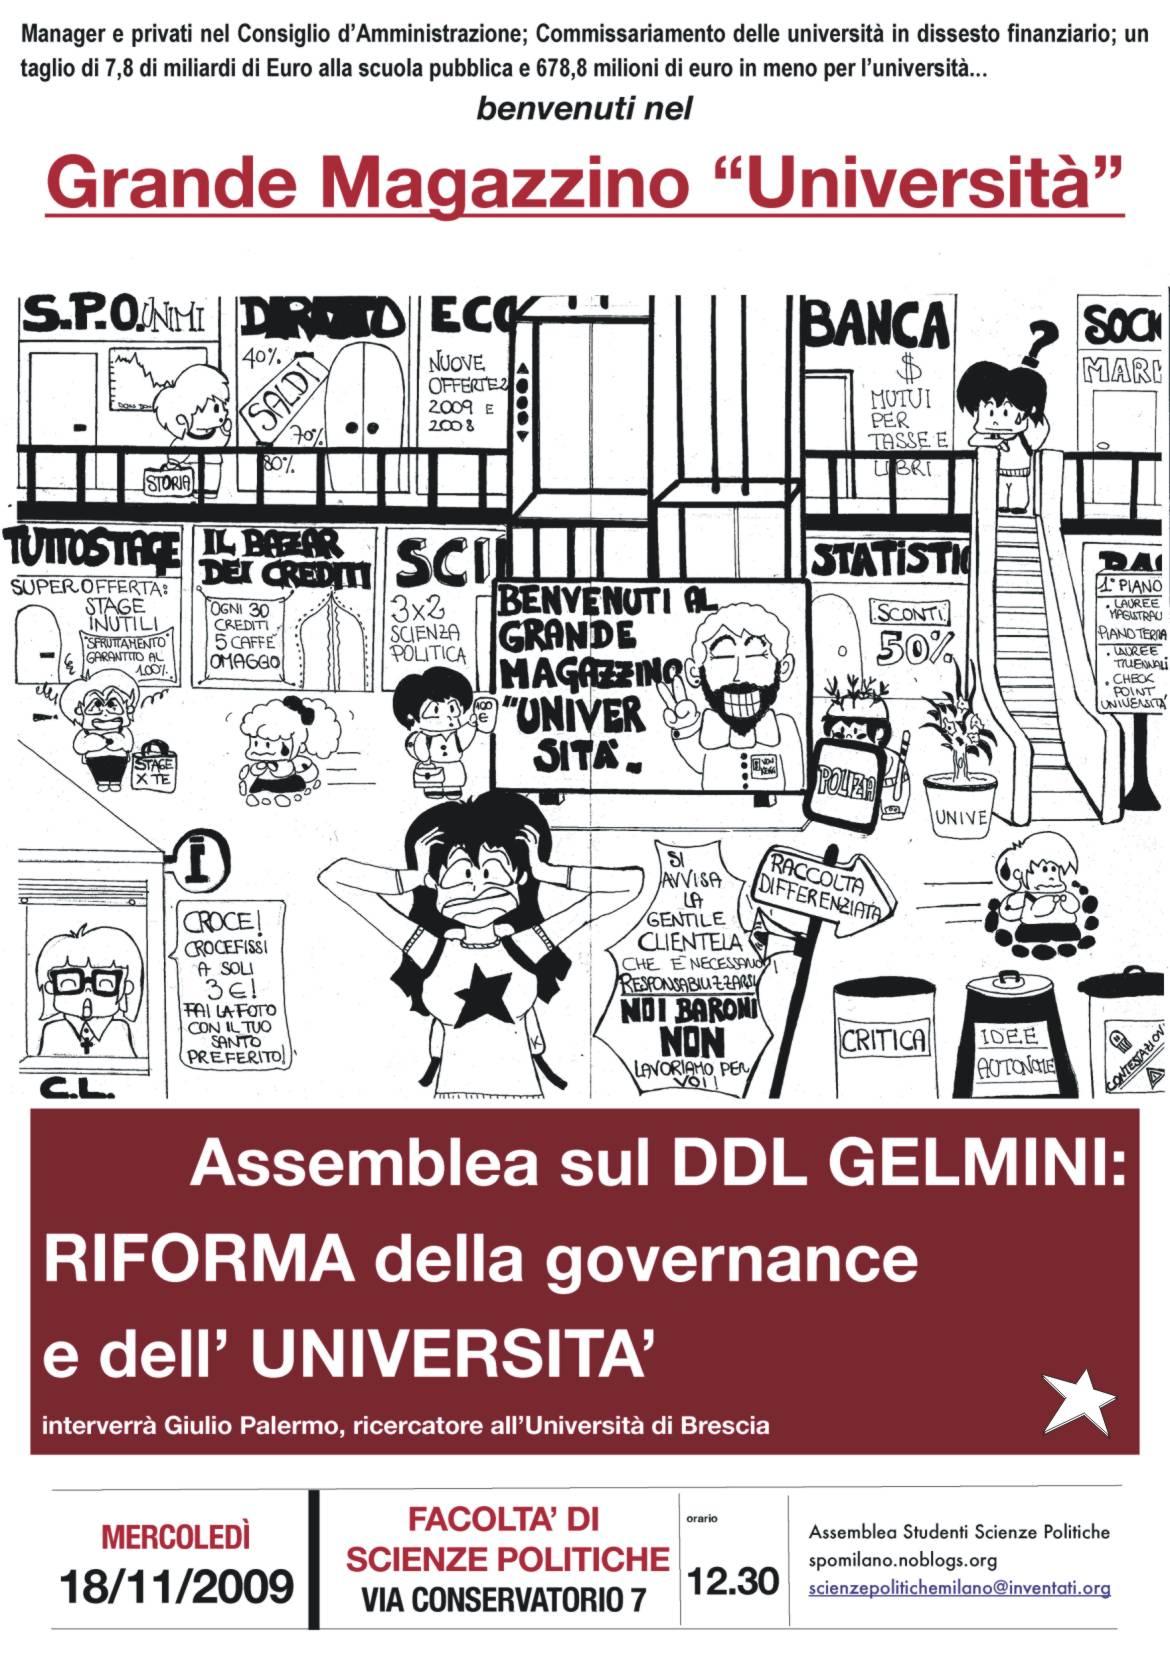 locandina assemblea sulla governance